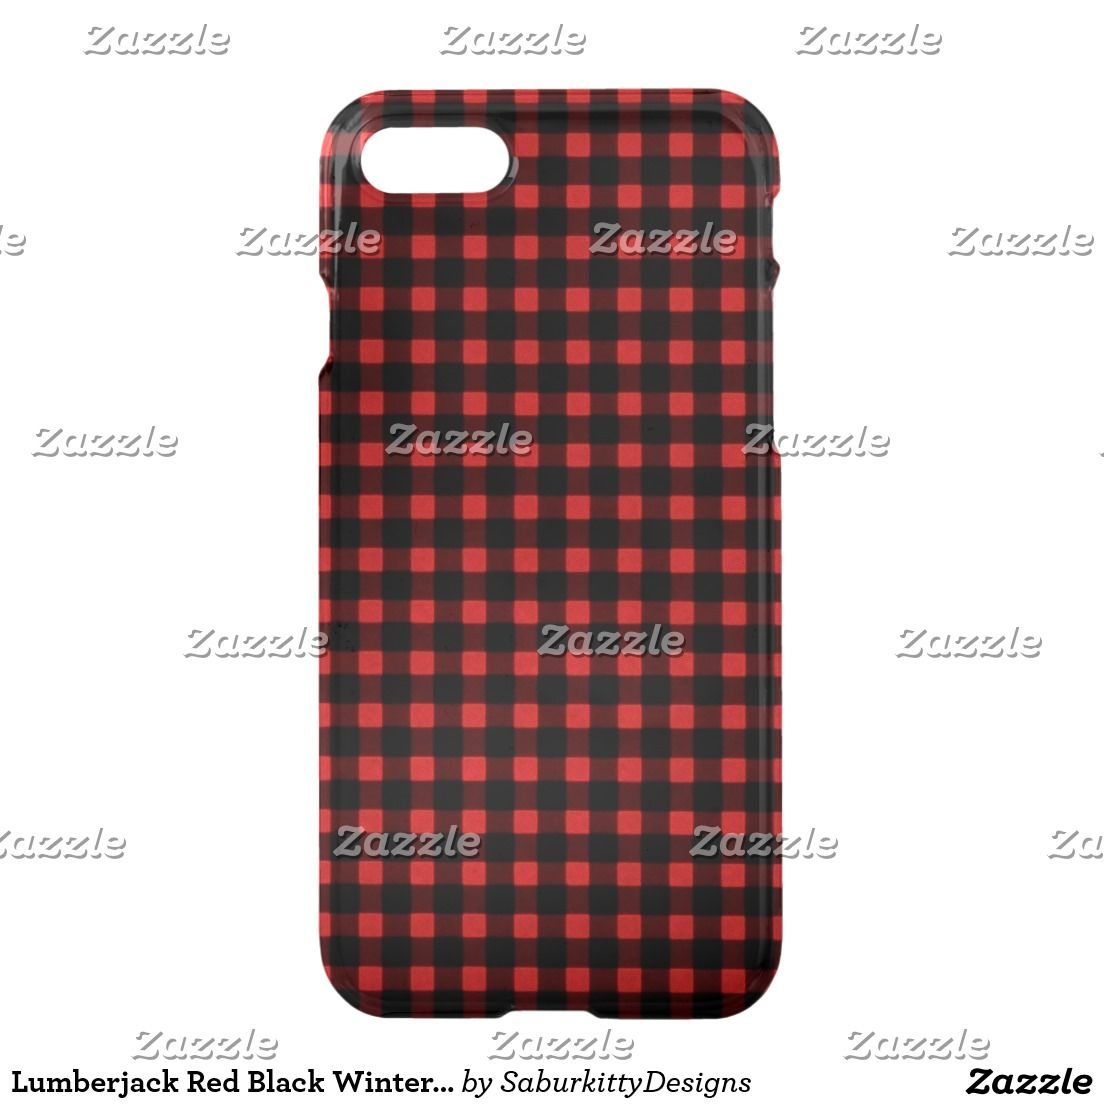 Lumberjack Red Black Winter Buffalo Plaid iPhone 7 Case